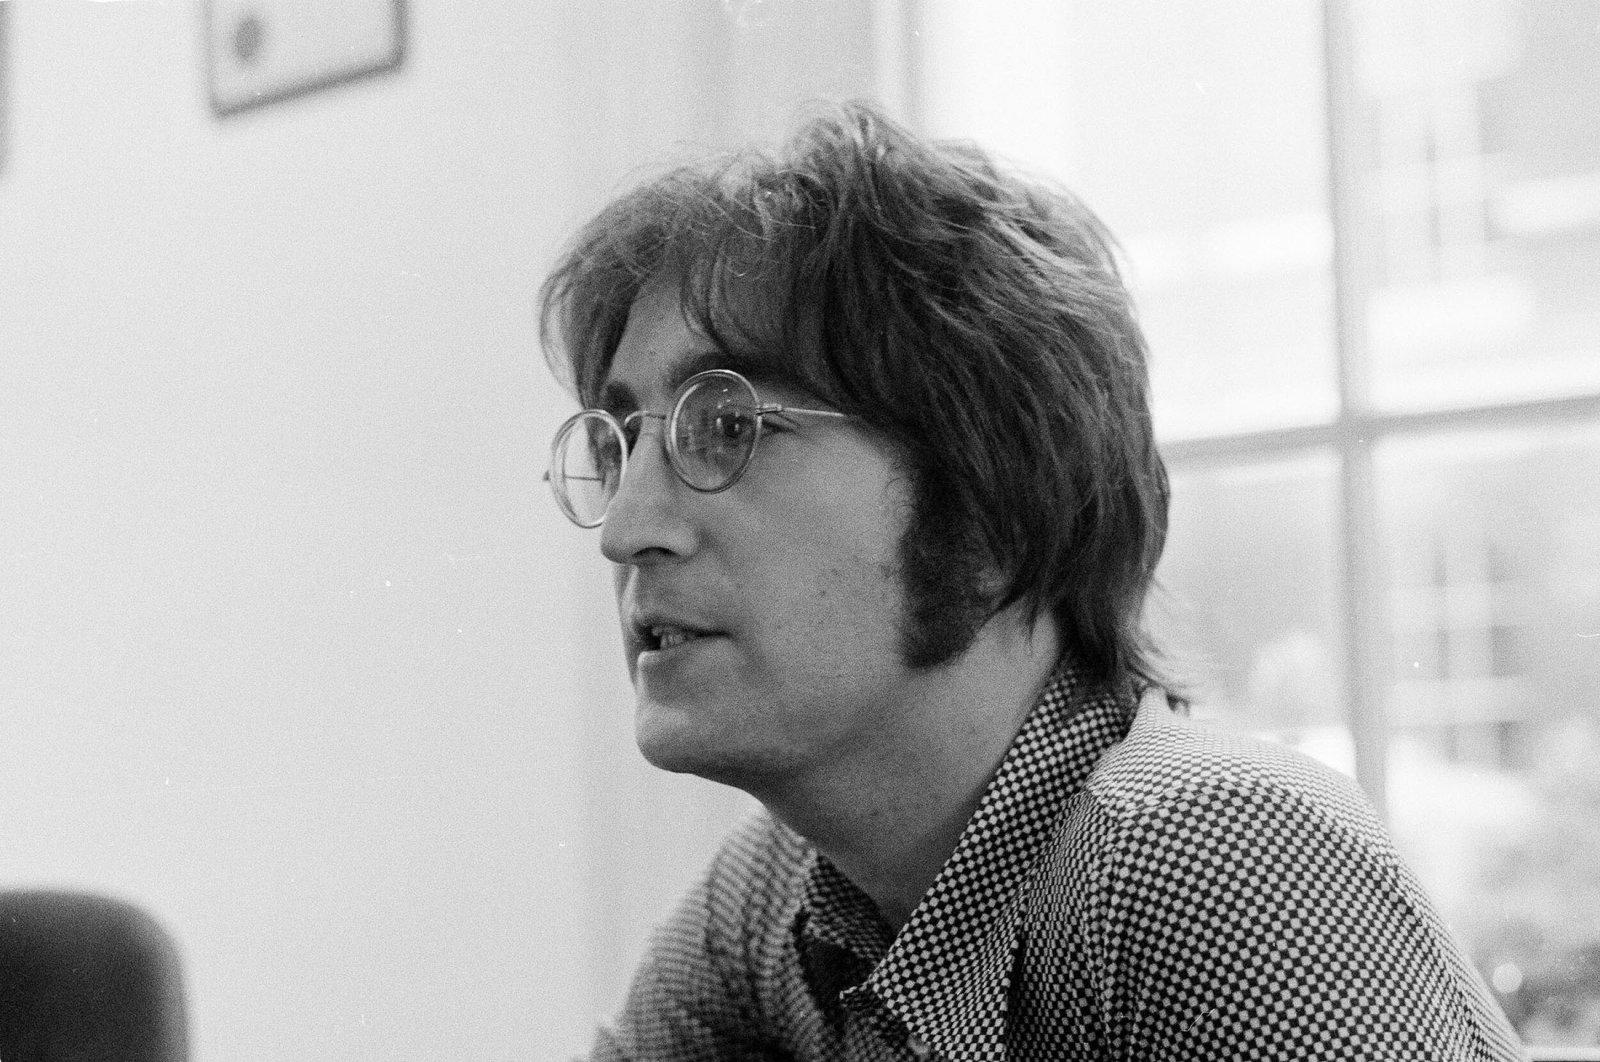 John Lennon is interviewed by journalist Steve Turner of Beat Instrumental magazine, Apple Records, London, U.K., July 19, 1971. (Getty Images)